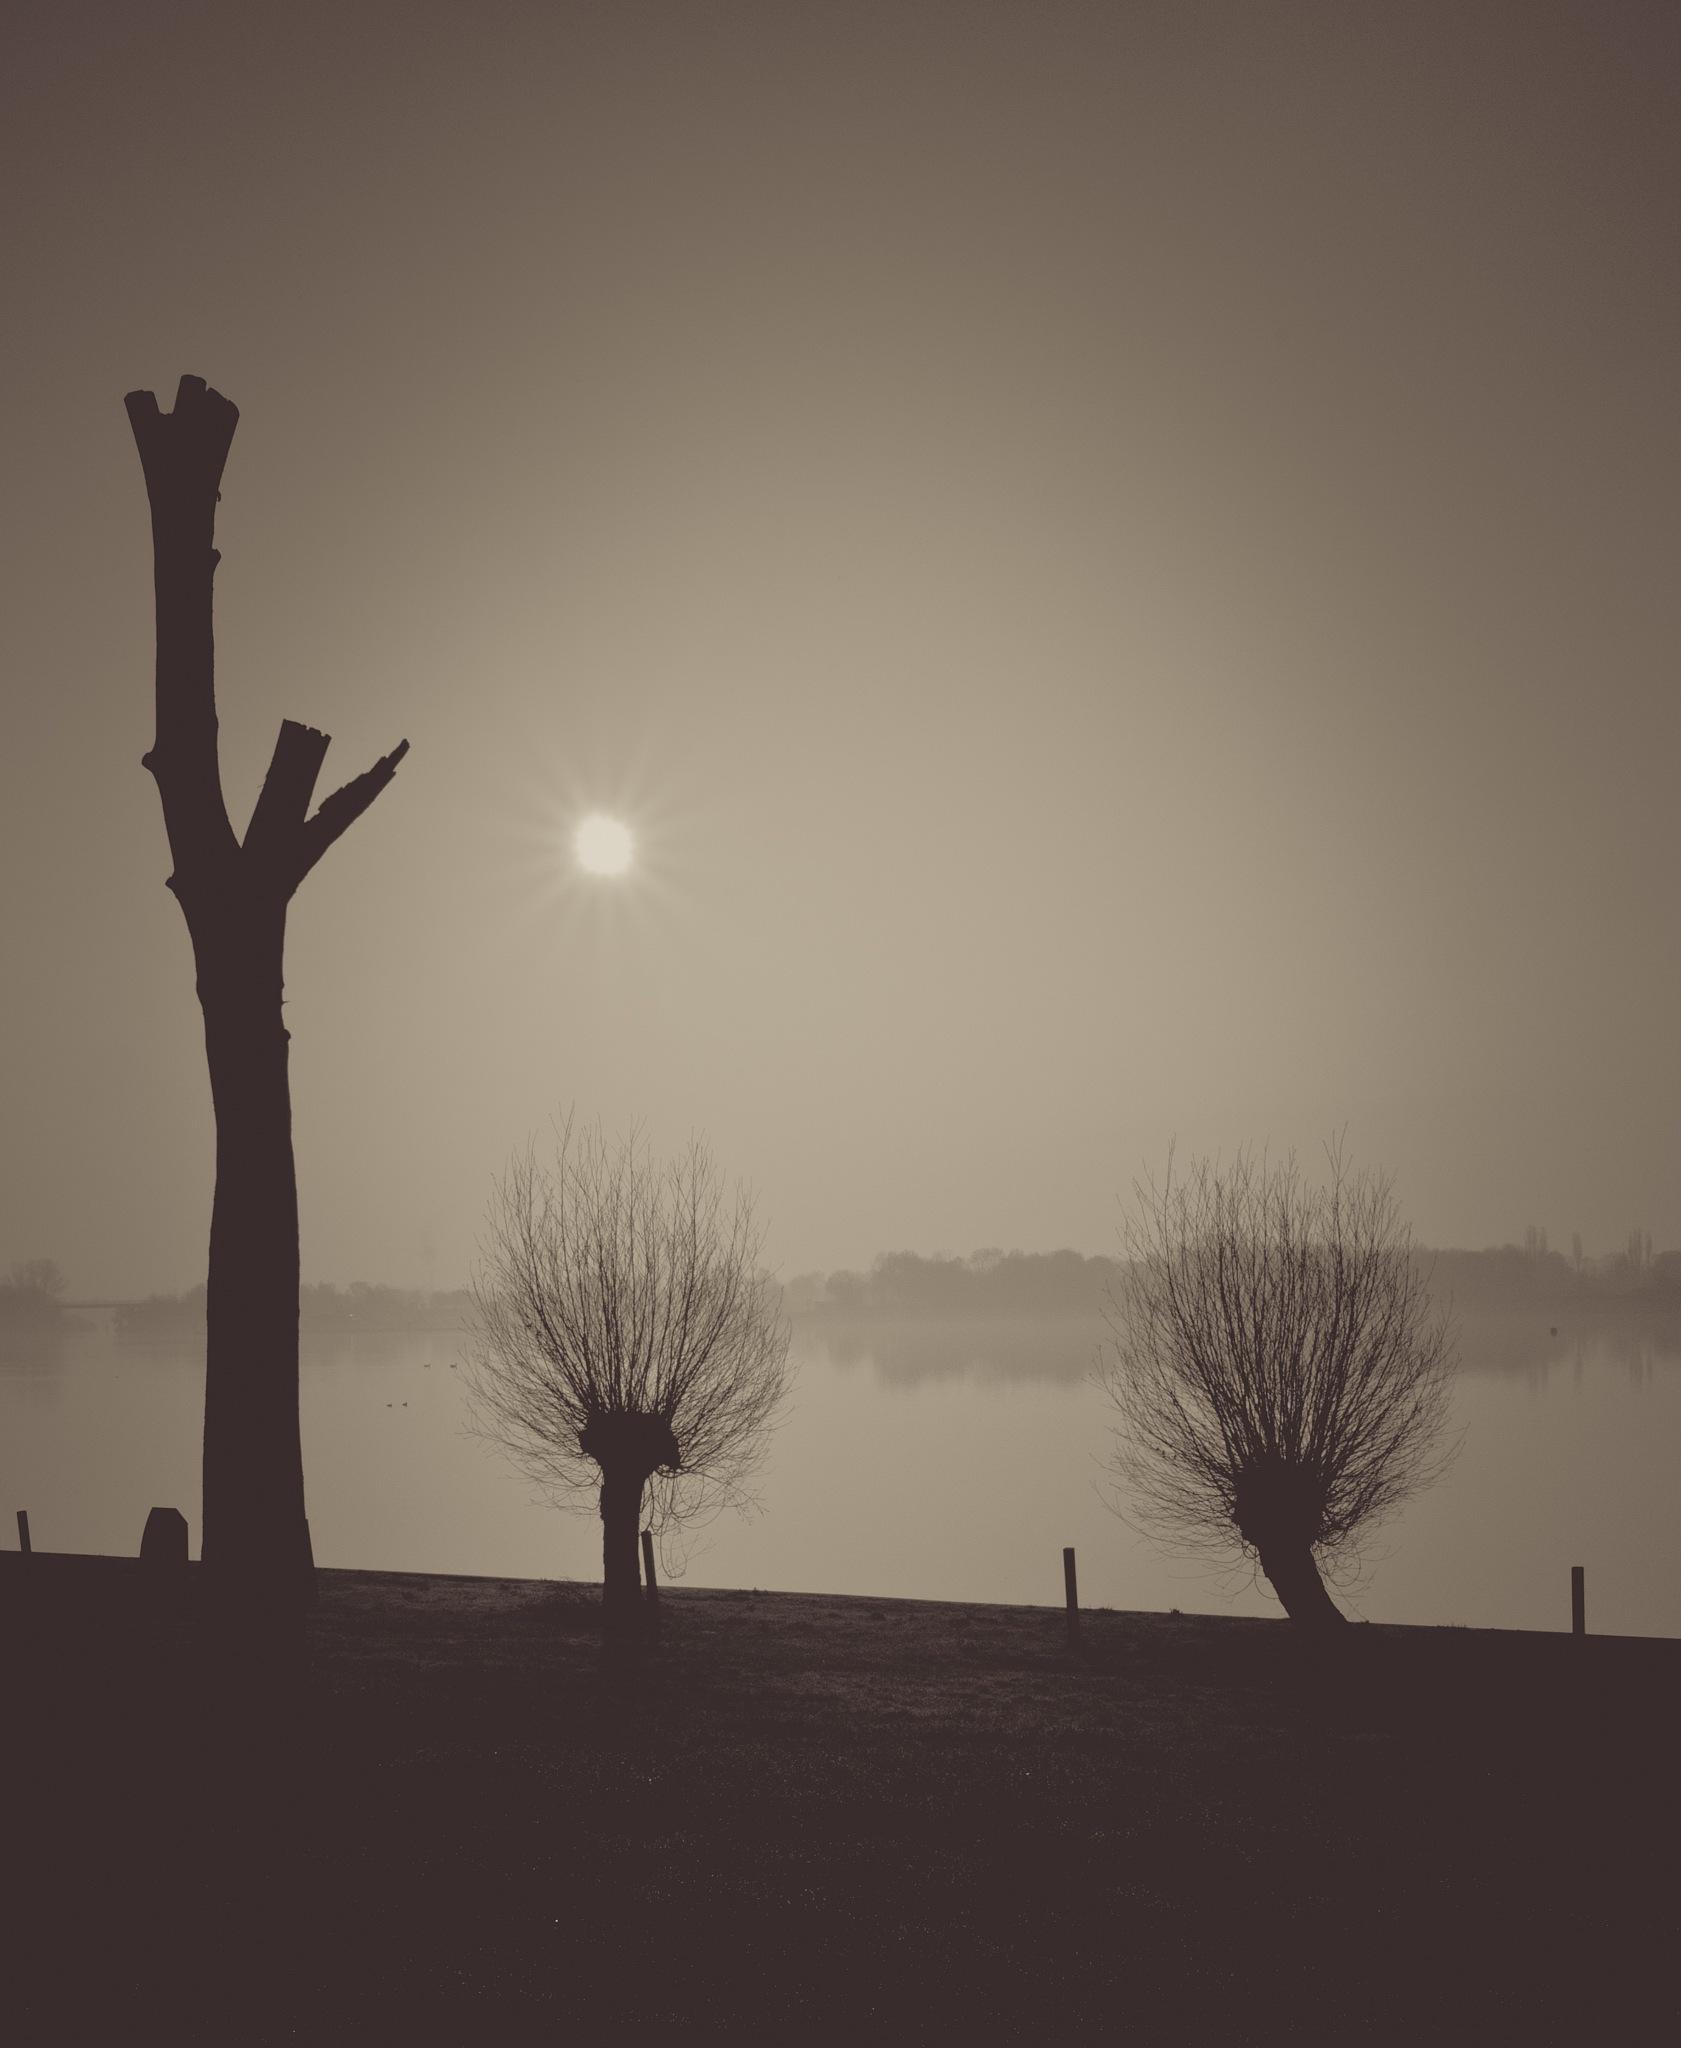 wake up people, day is raising here by Marcin Majkowski